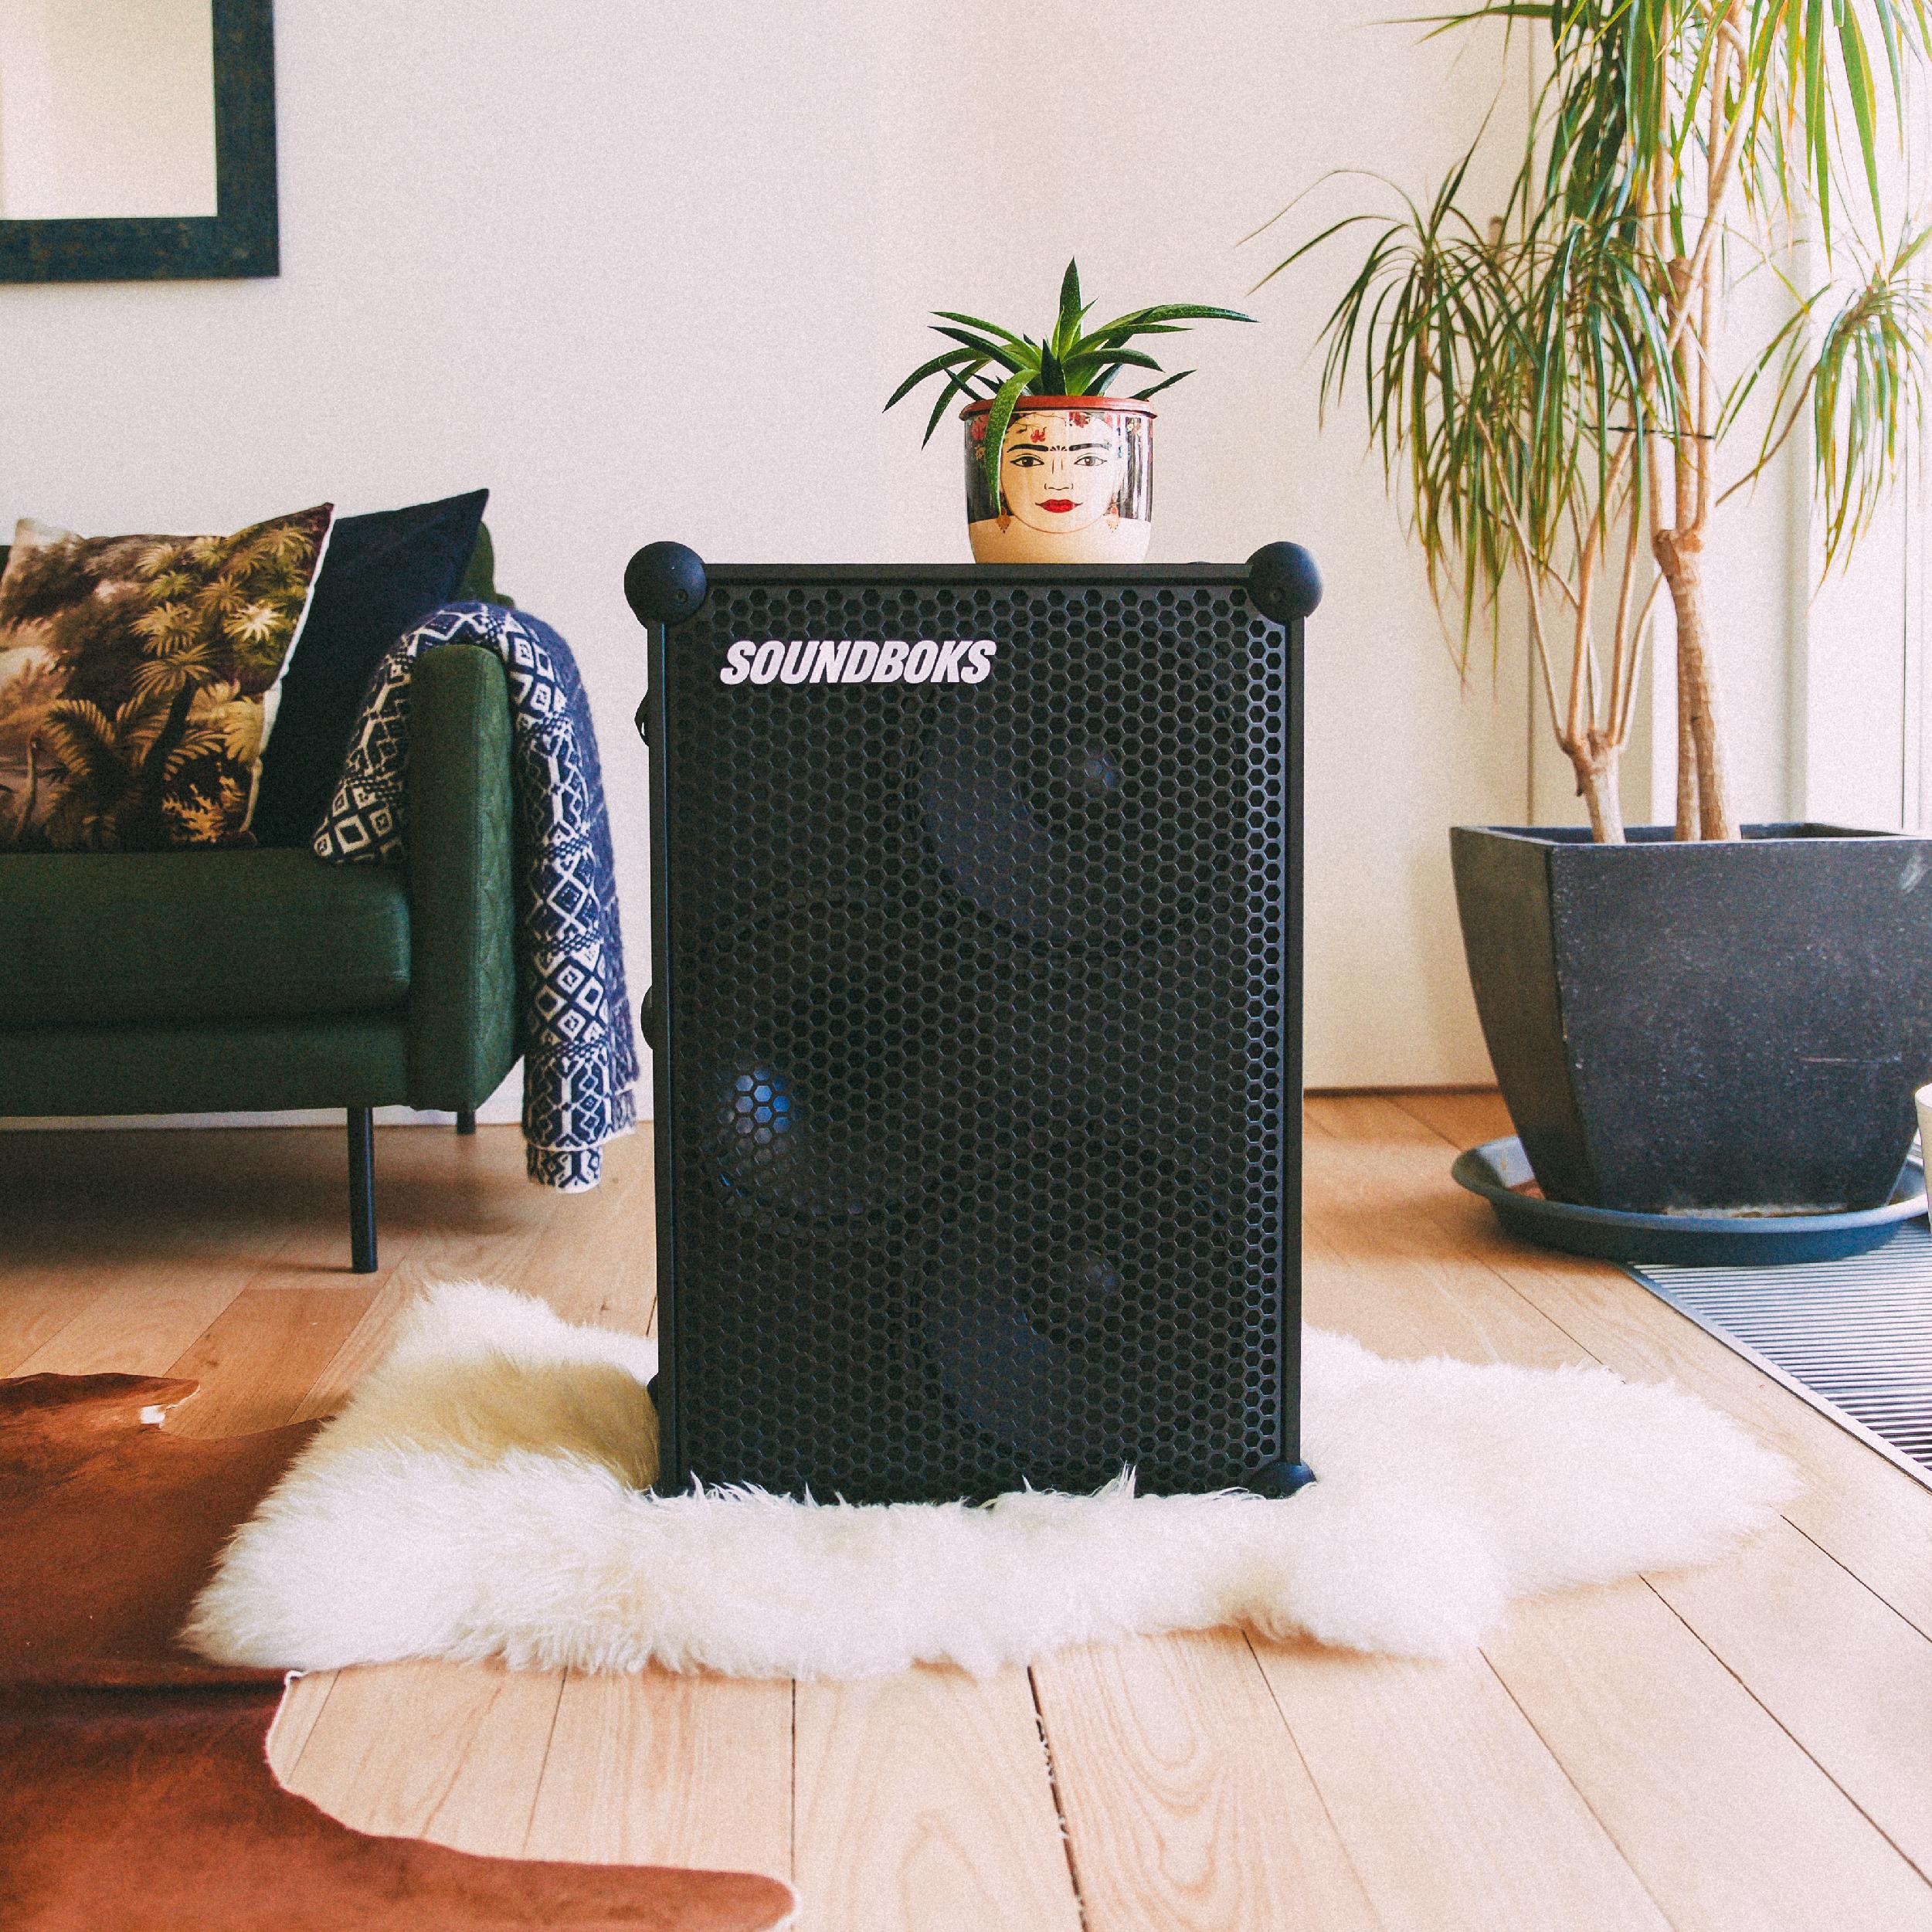 SOUNDBOKS speaker in cozy home environment